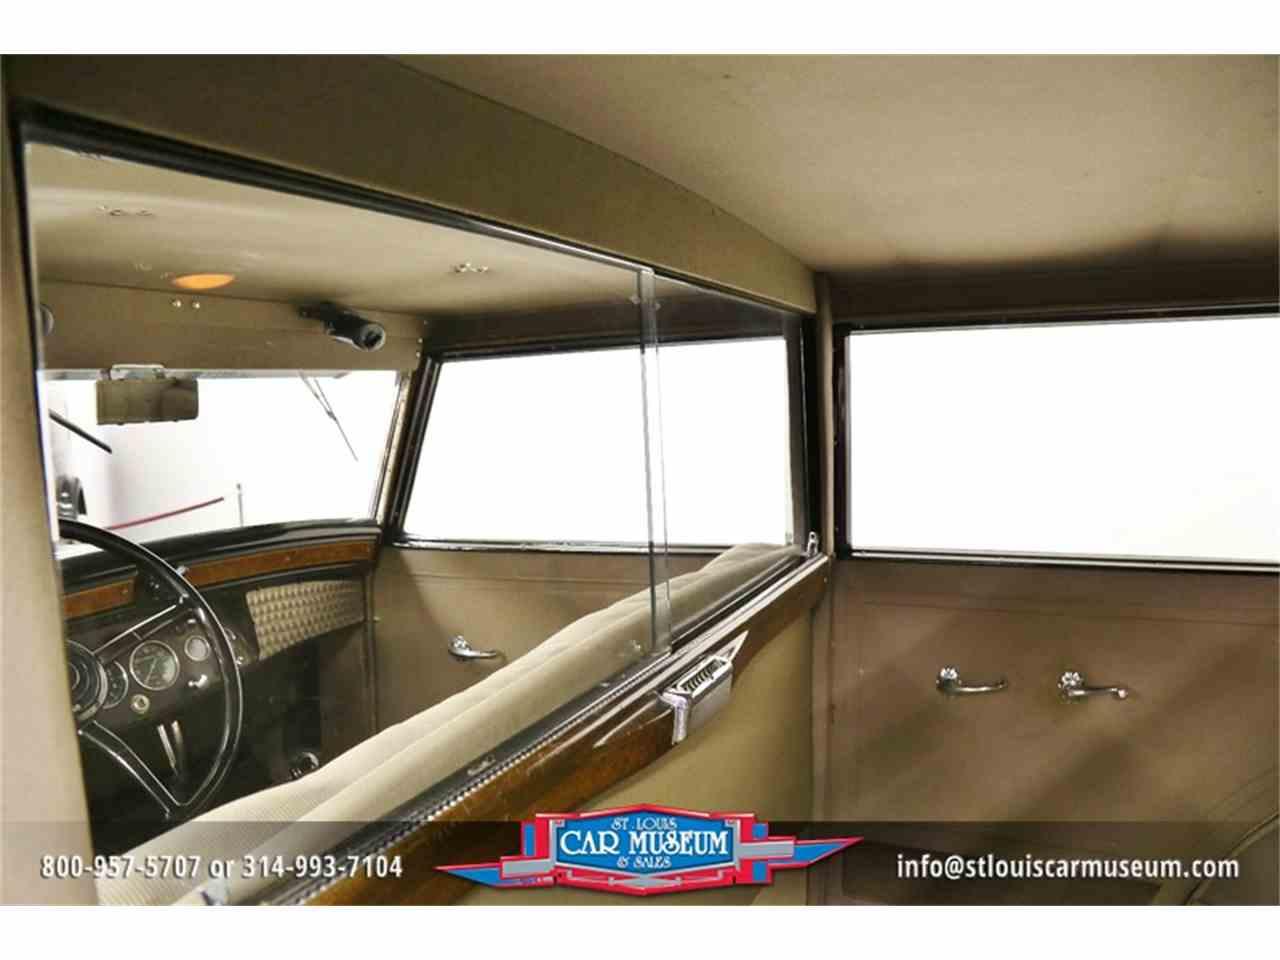 Large Picture of '31 Cadillac V-16 Madam X Landau Sedan located in St. Louis Missouri - JSU3